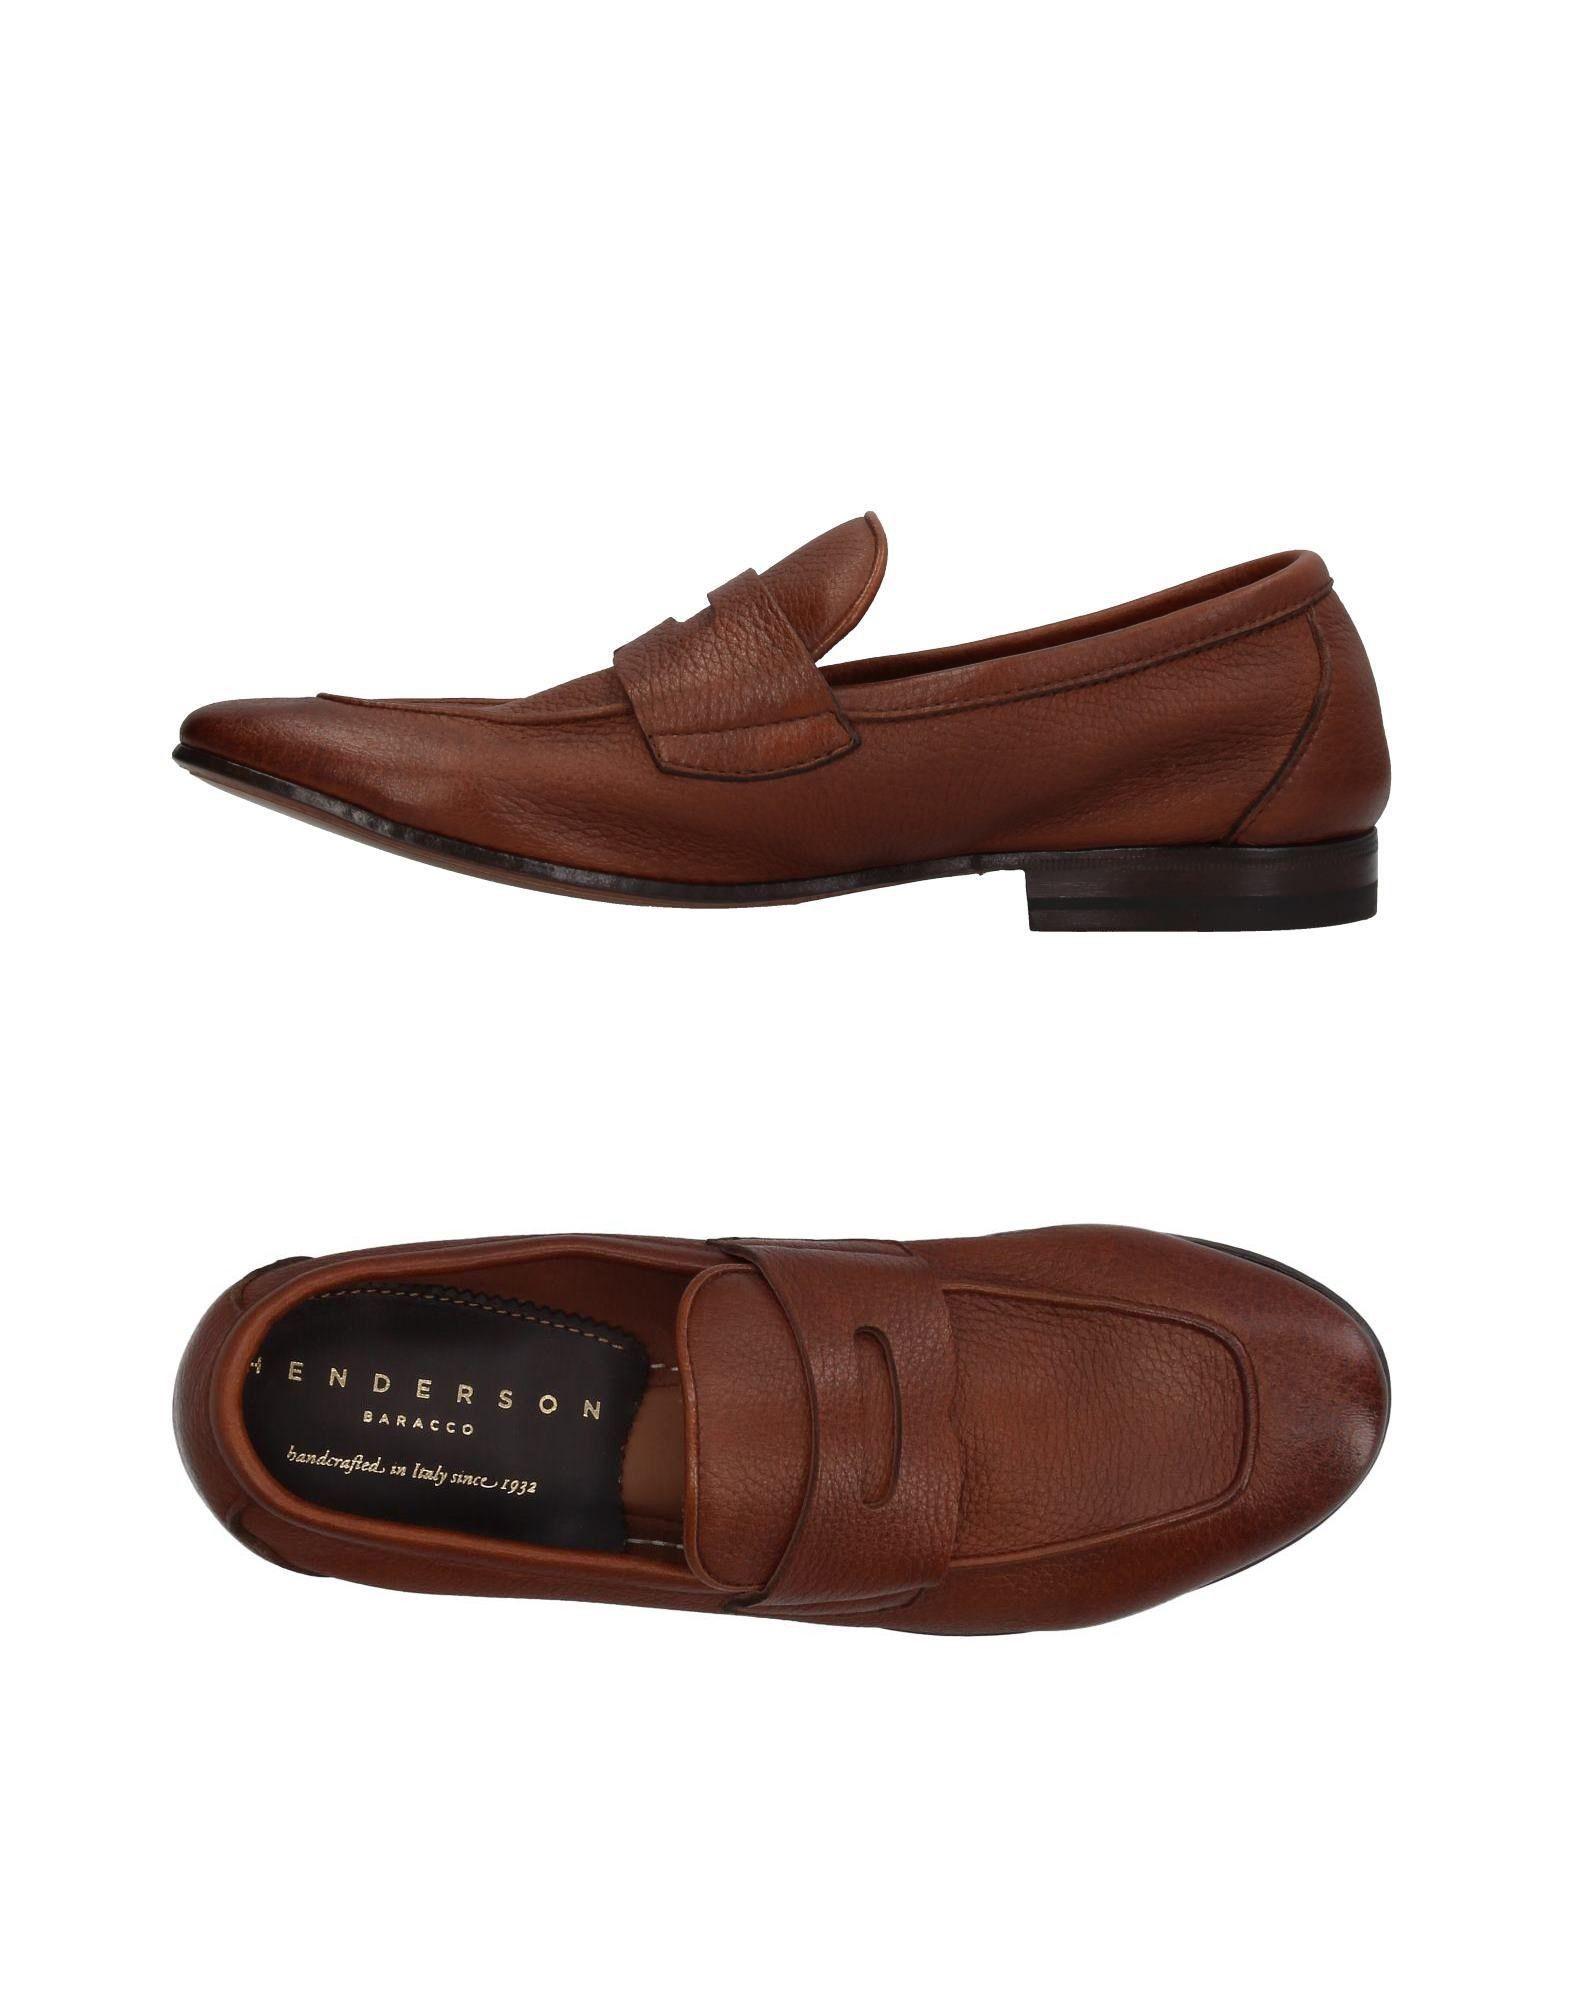 HENDERSON BARACCO Cowhide loafers CyojmKUb5